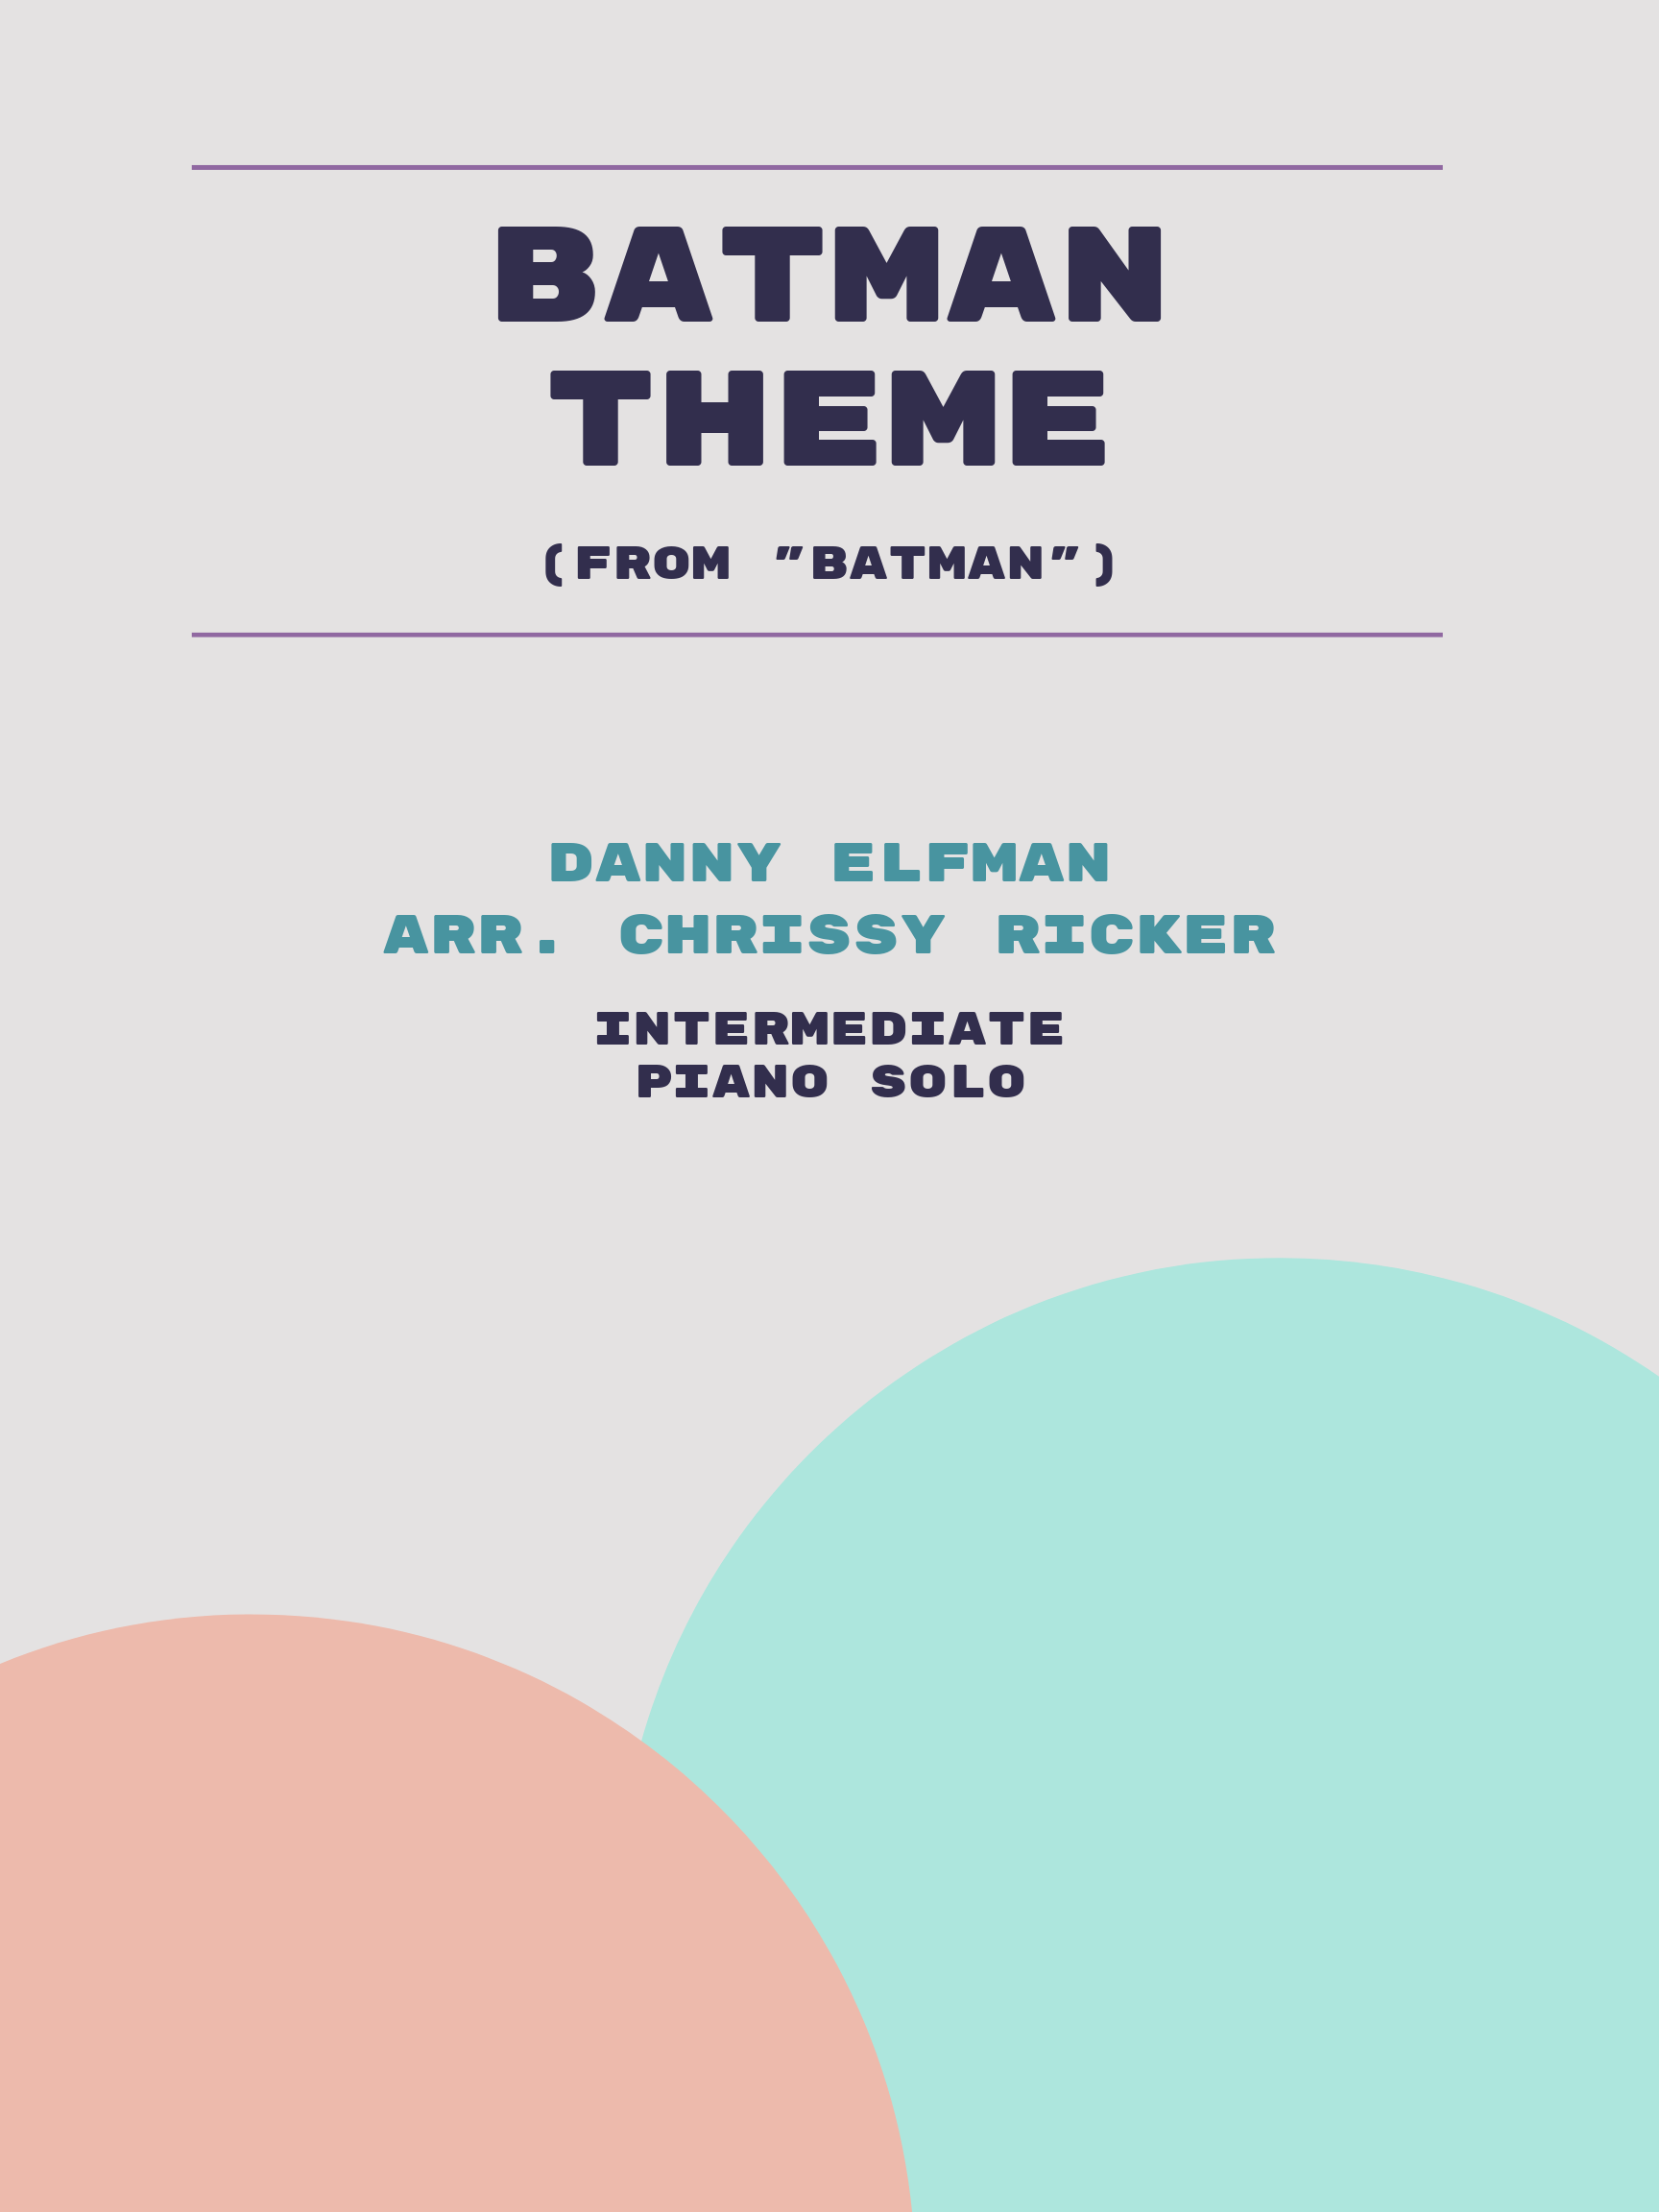 Batman Theme by Danny Elfman